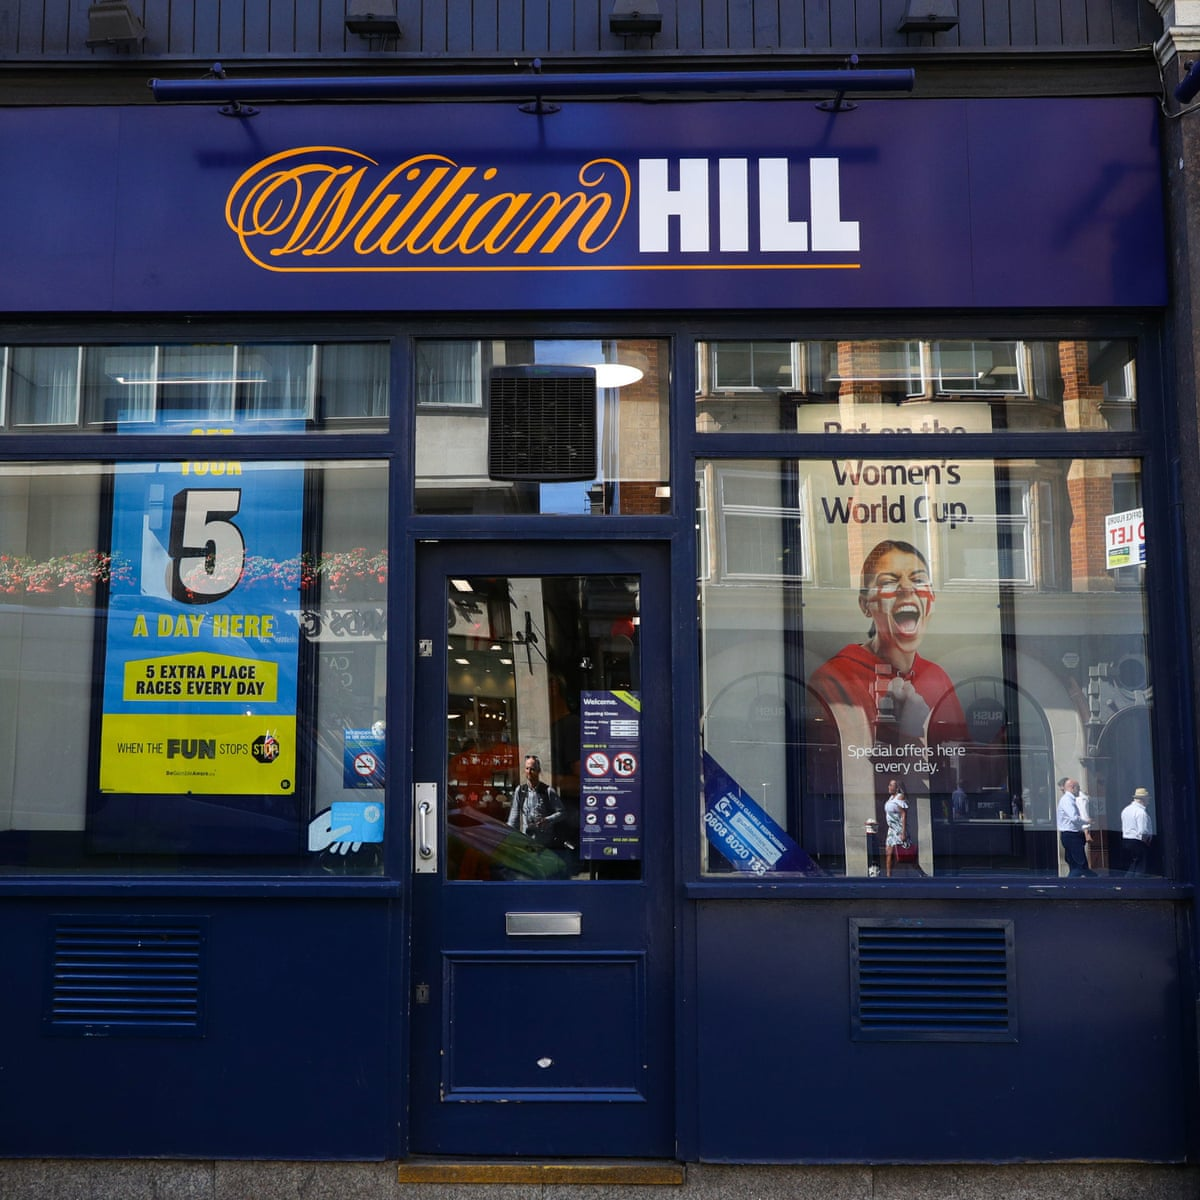 William hill betting shops uk